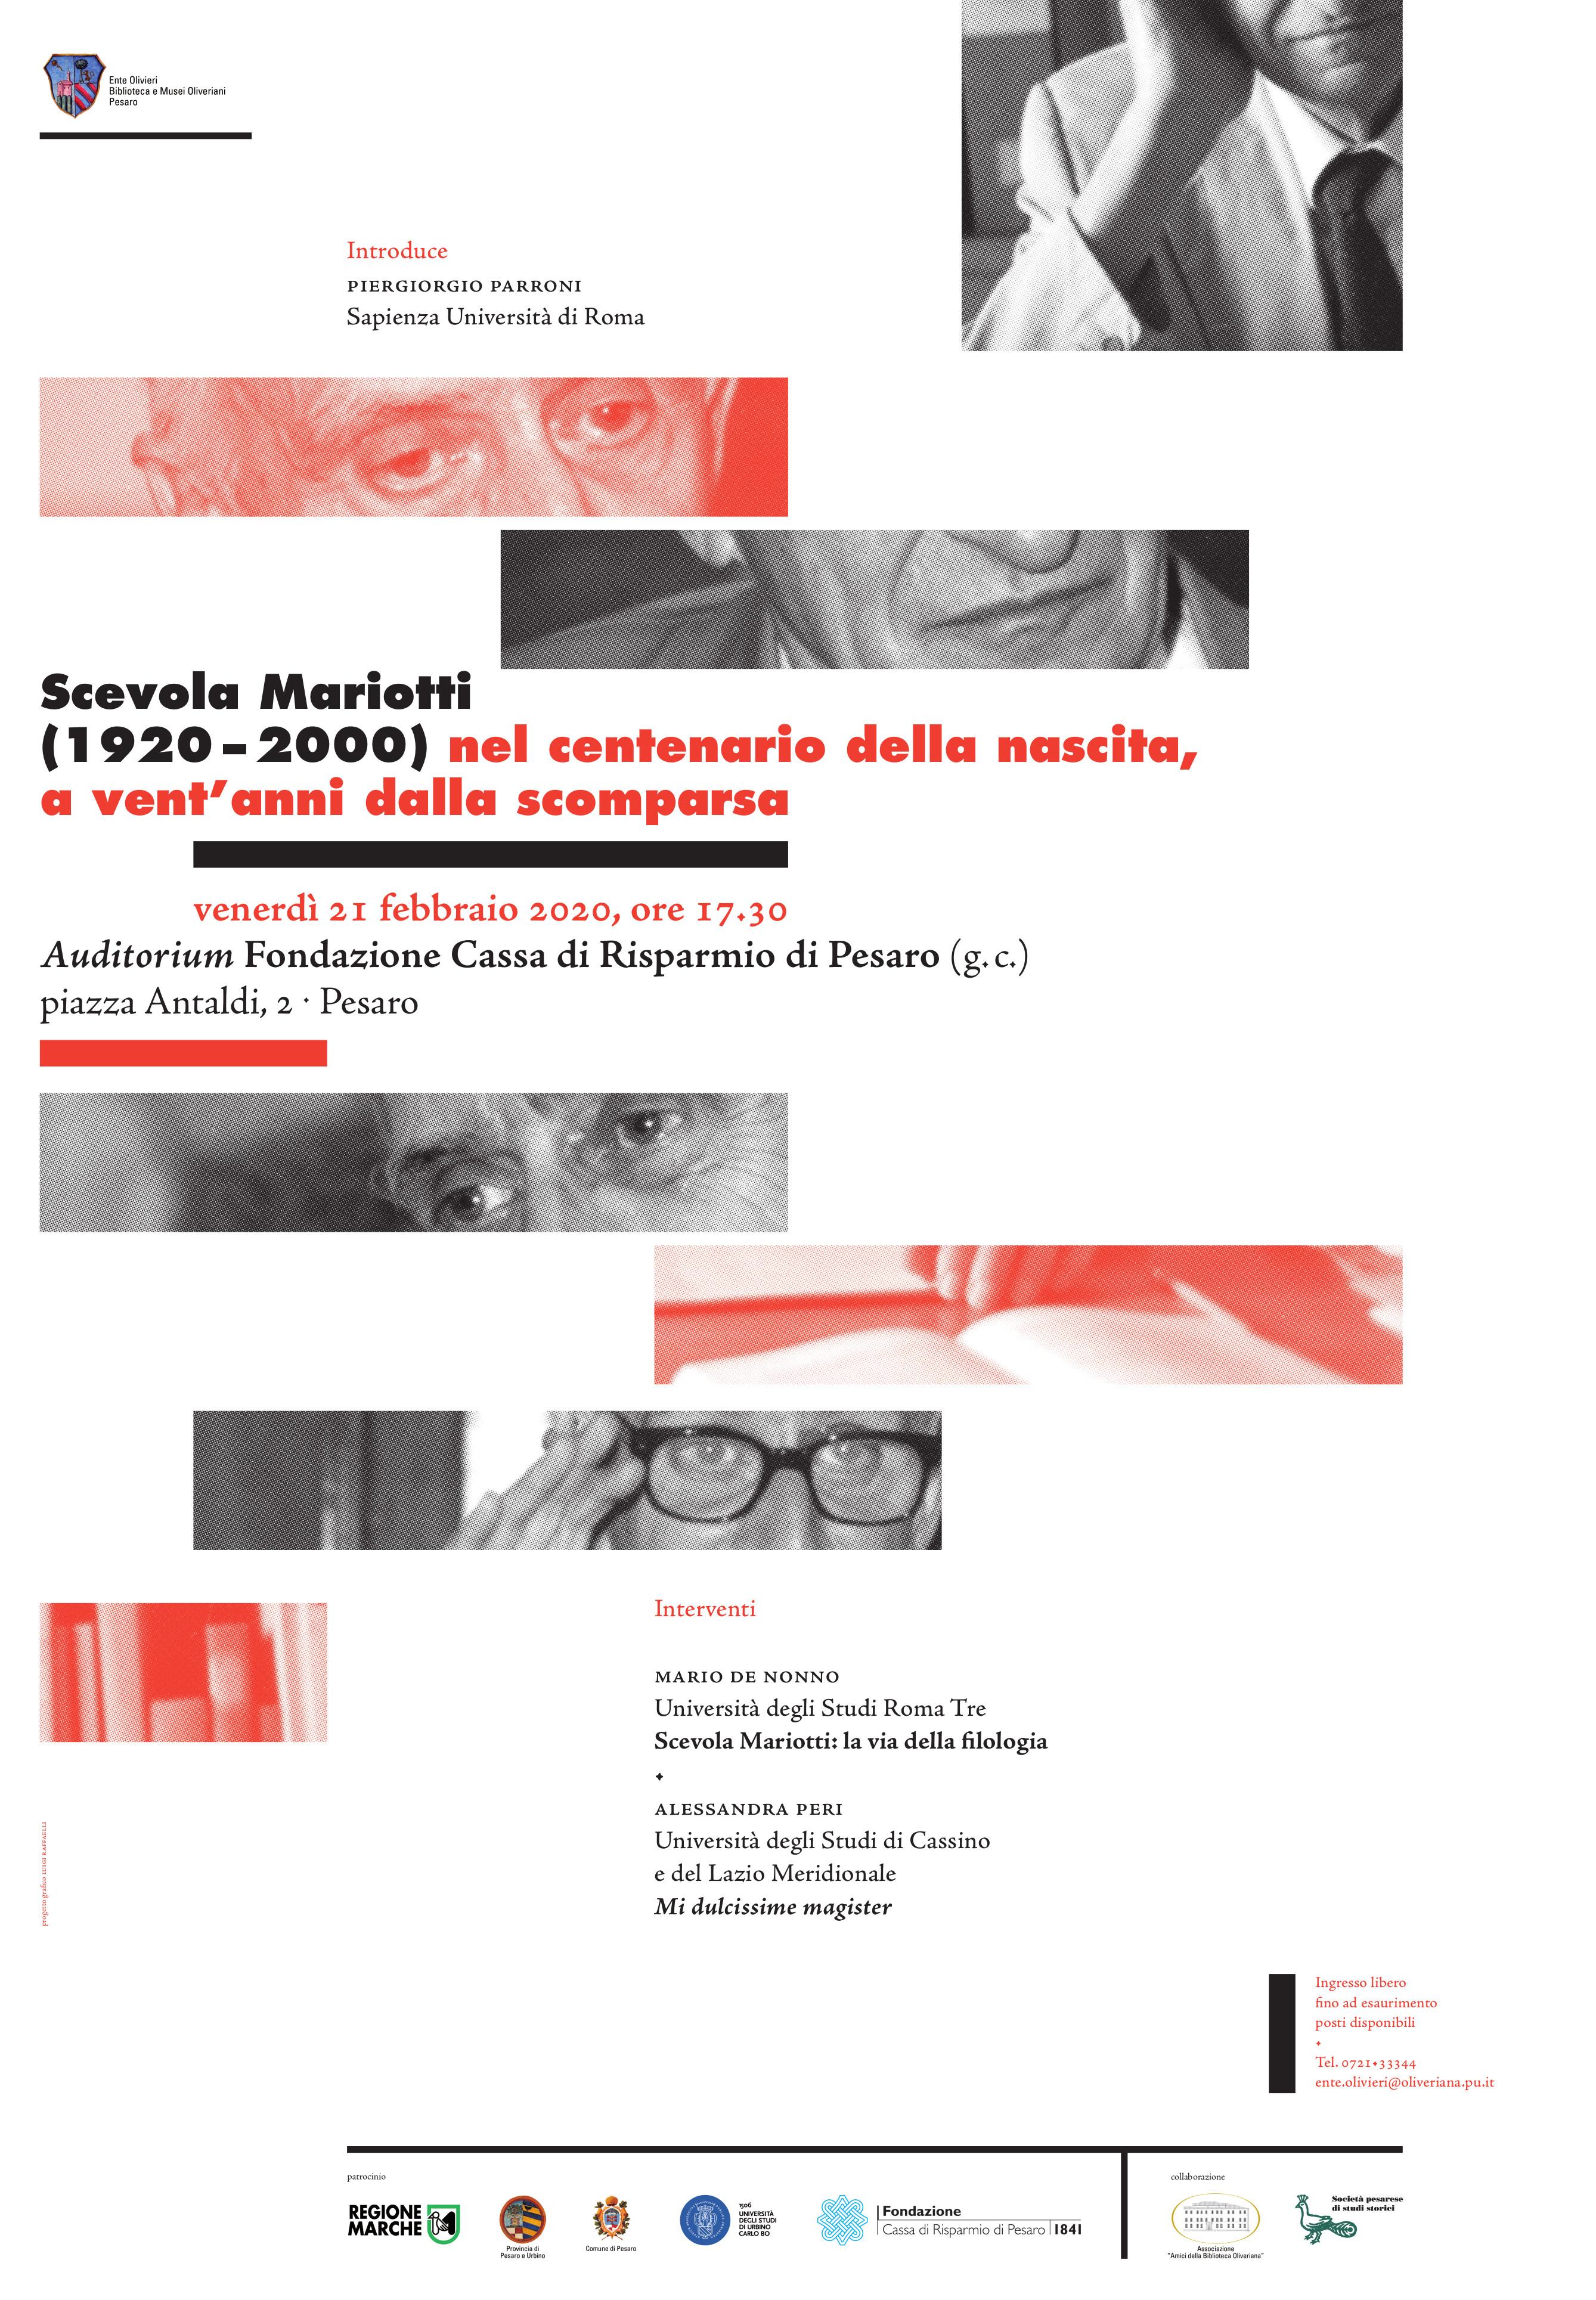 Mariotti.manifesto.jpg